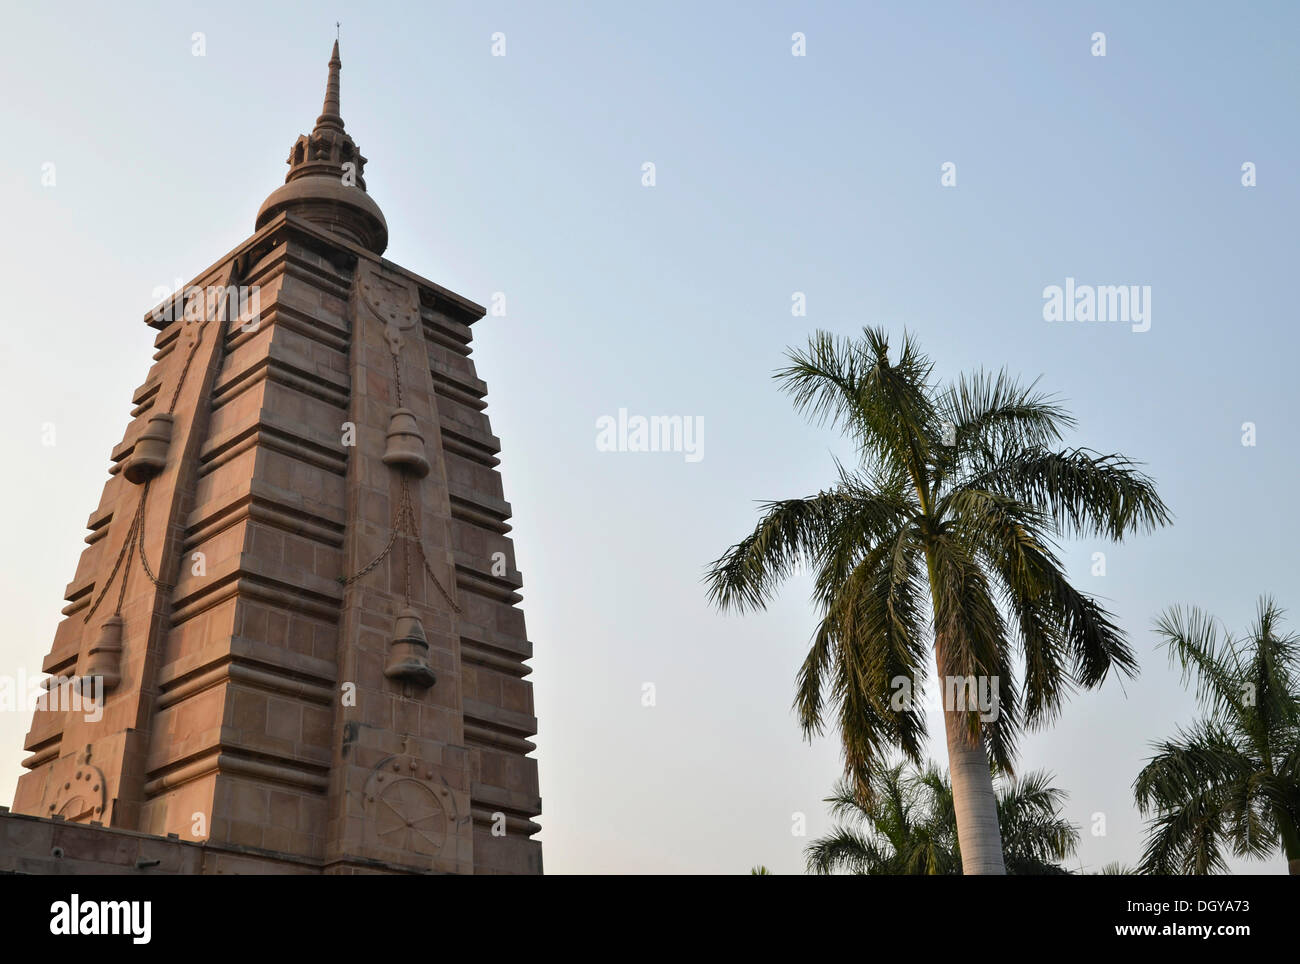 Kutti Vihar Temple, Mulagandha Kuti Vihara, Buddhist pilgrimage destination, Sarnath, Varanasi, Uttar Pradesh, India, - Stock Image